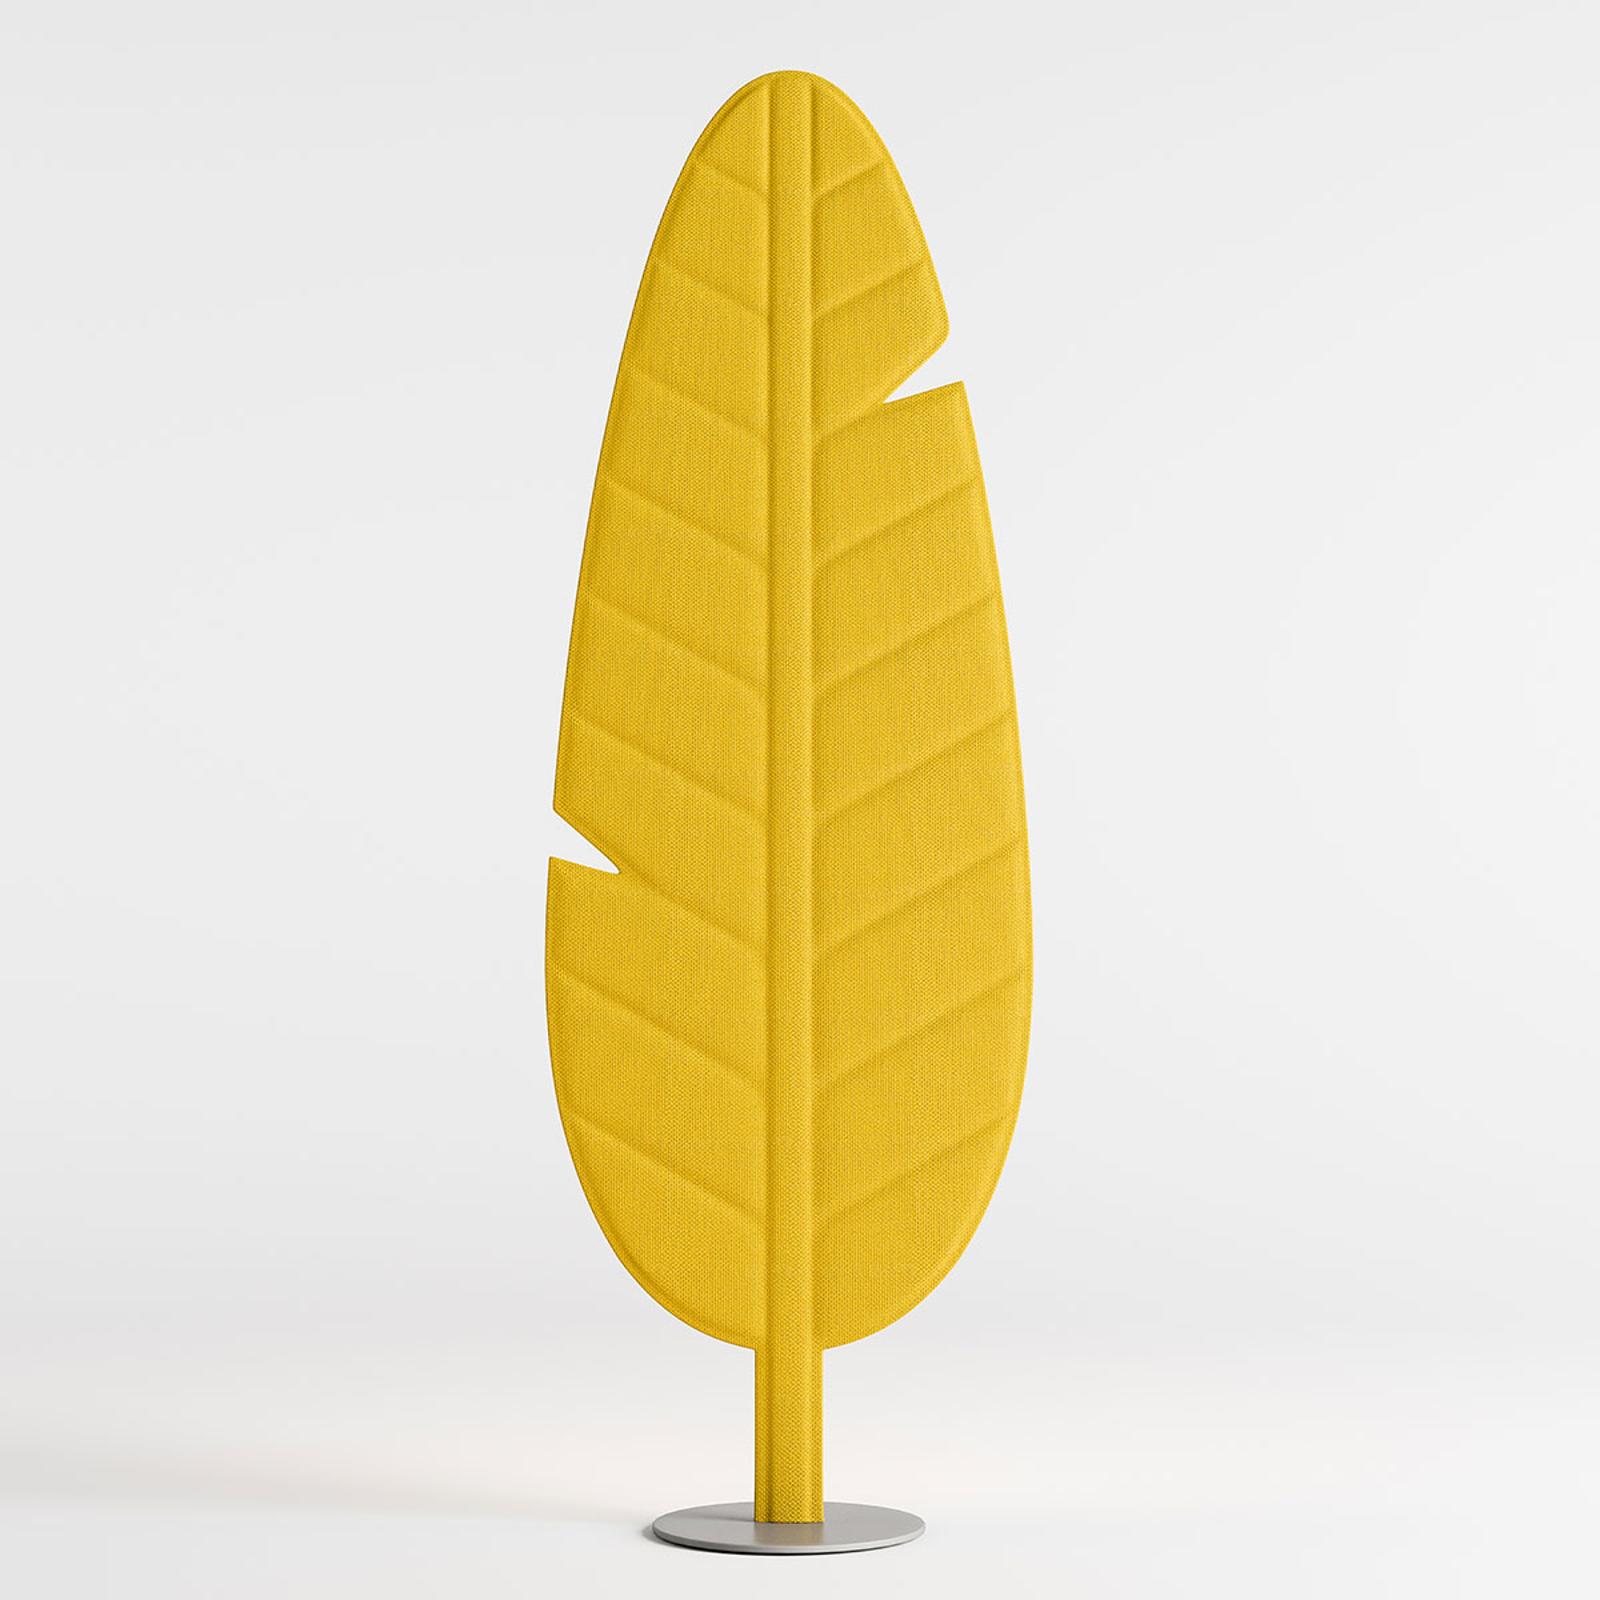 Rotaliana Eden Banana LED-Stehleuchte, gelb